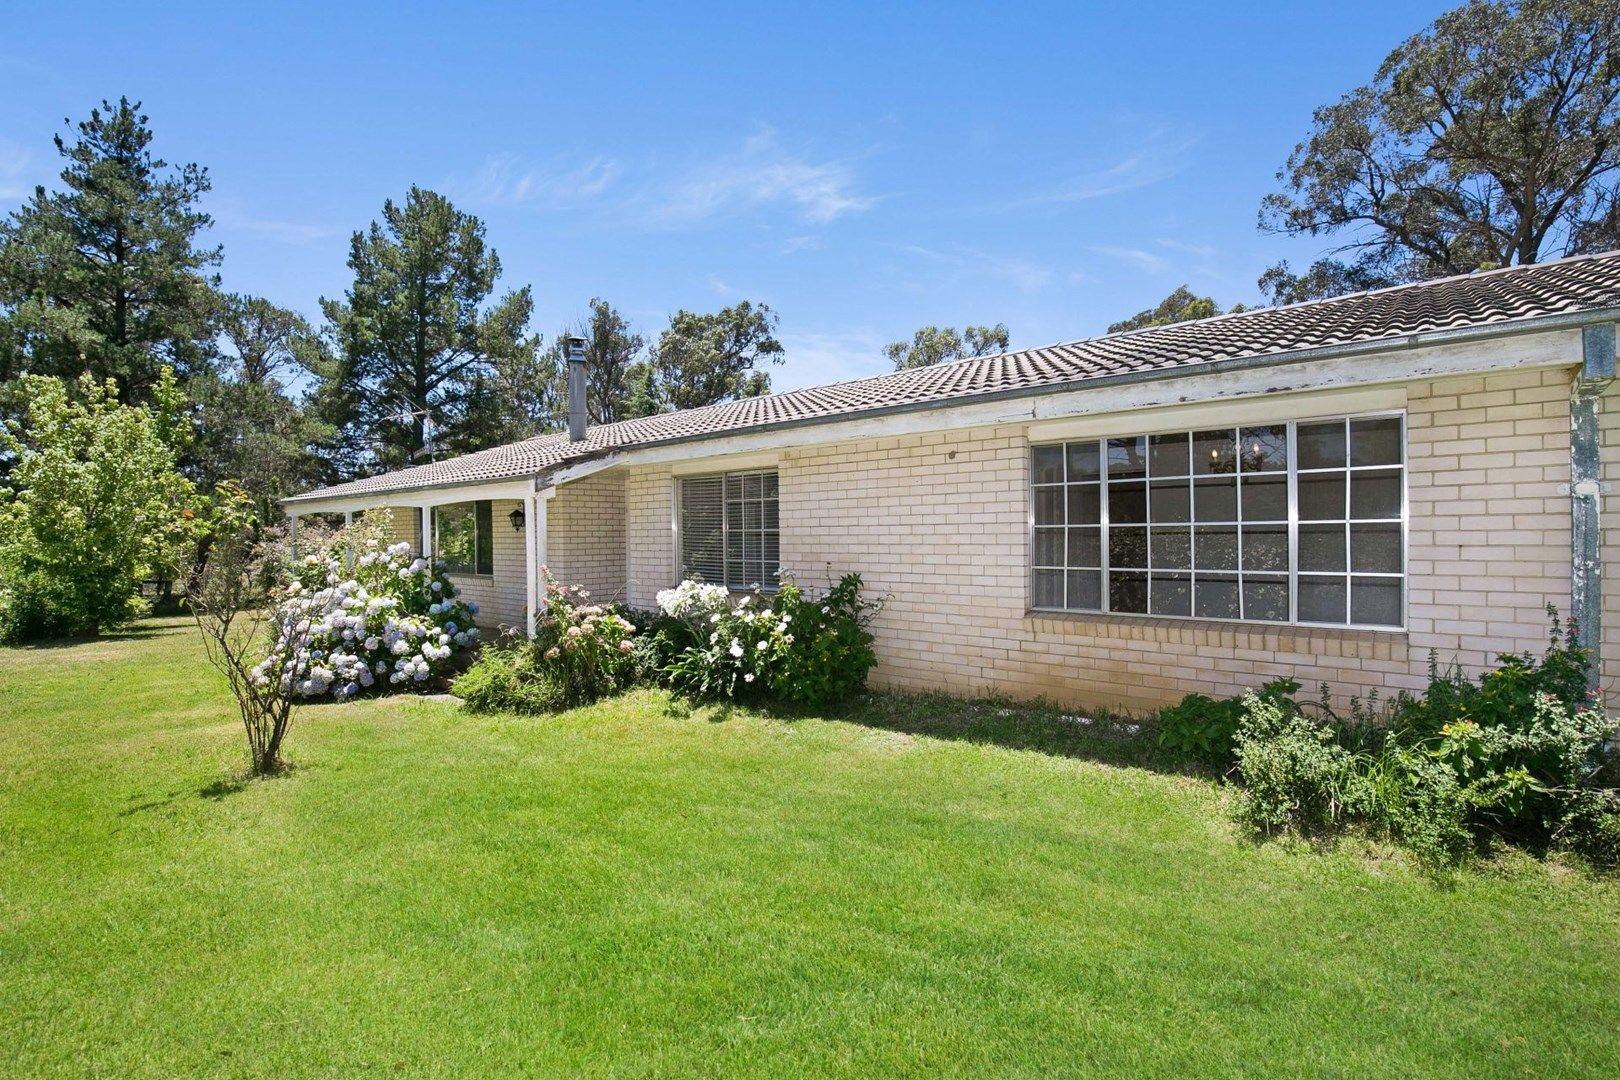 603 Long Swamp Rd, Armidale NSW 2350, Image 0